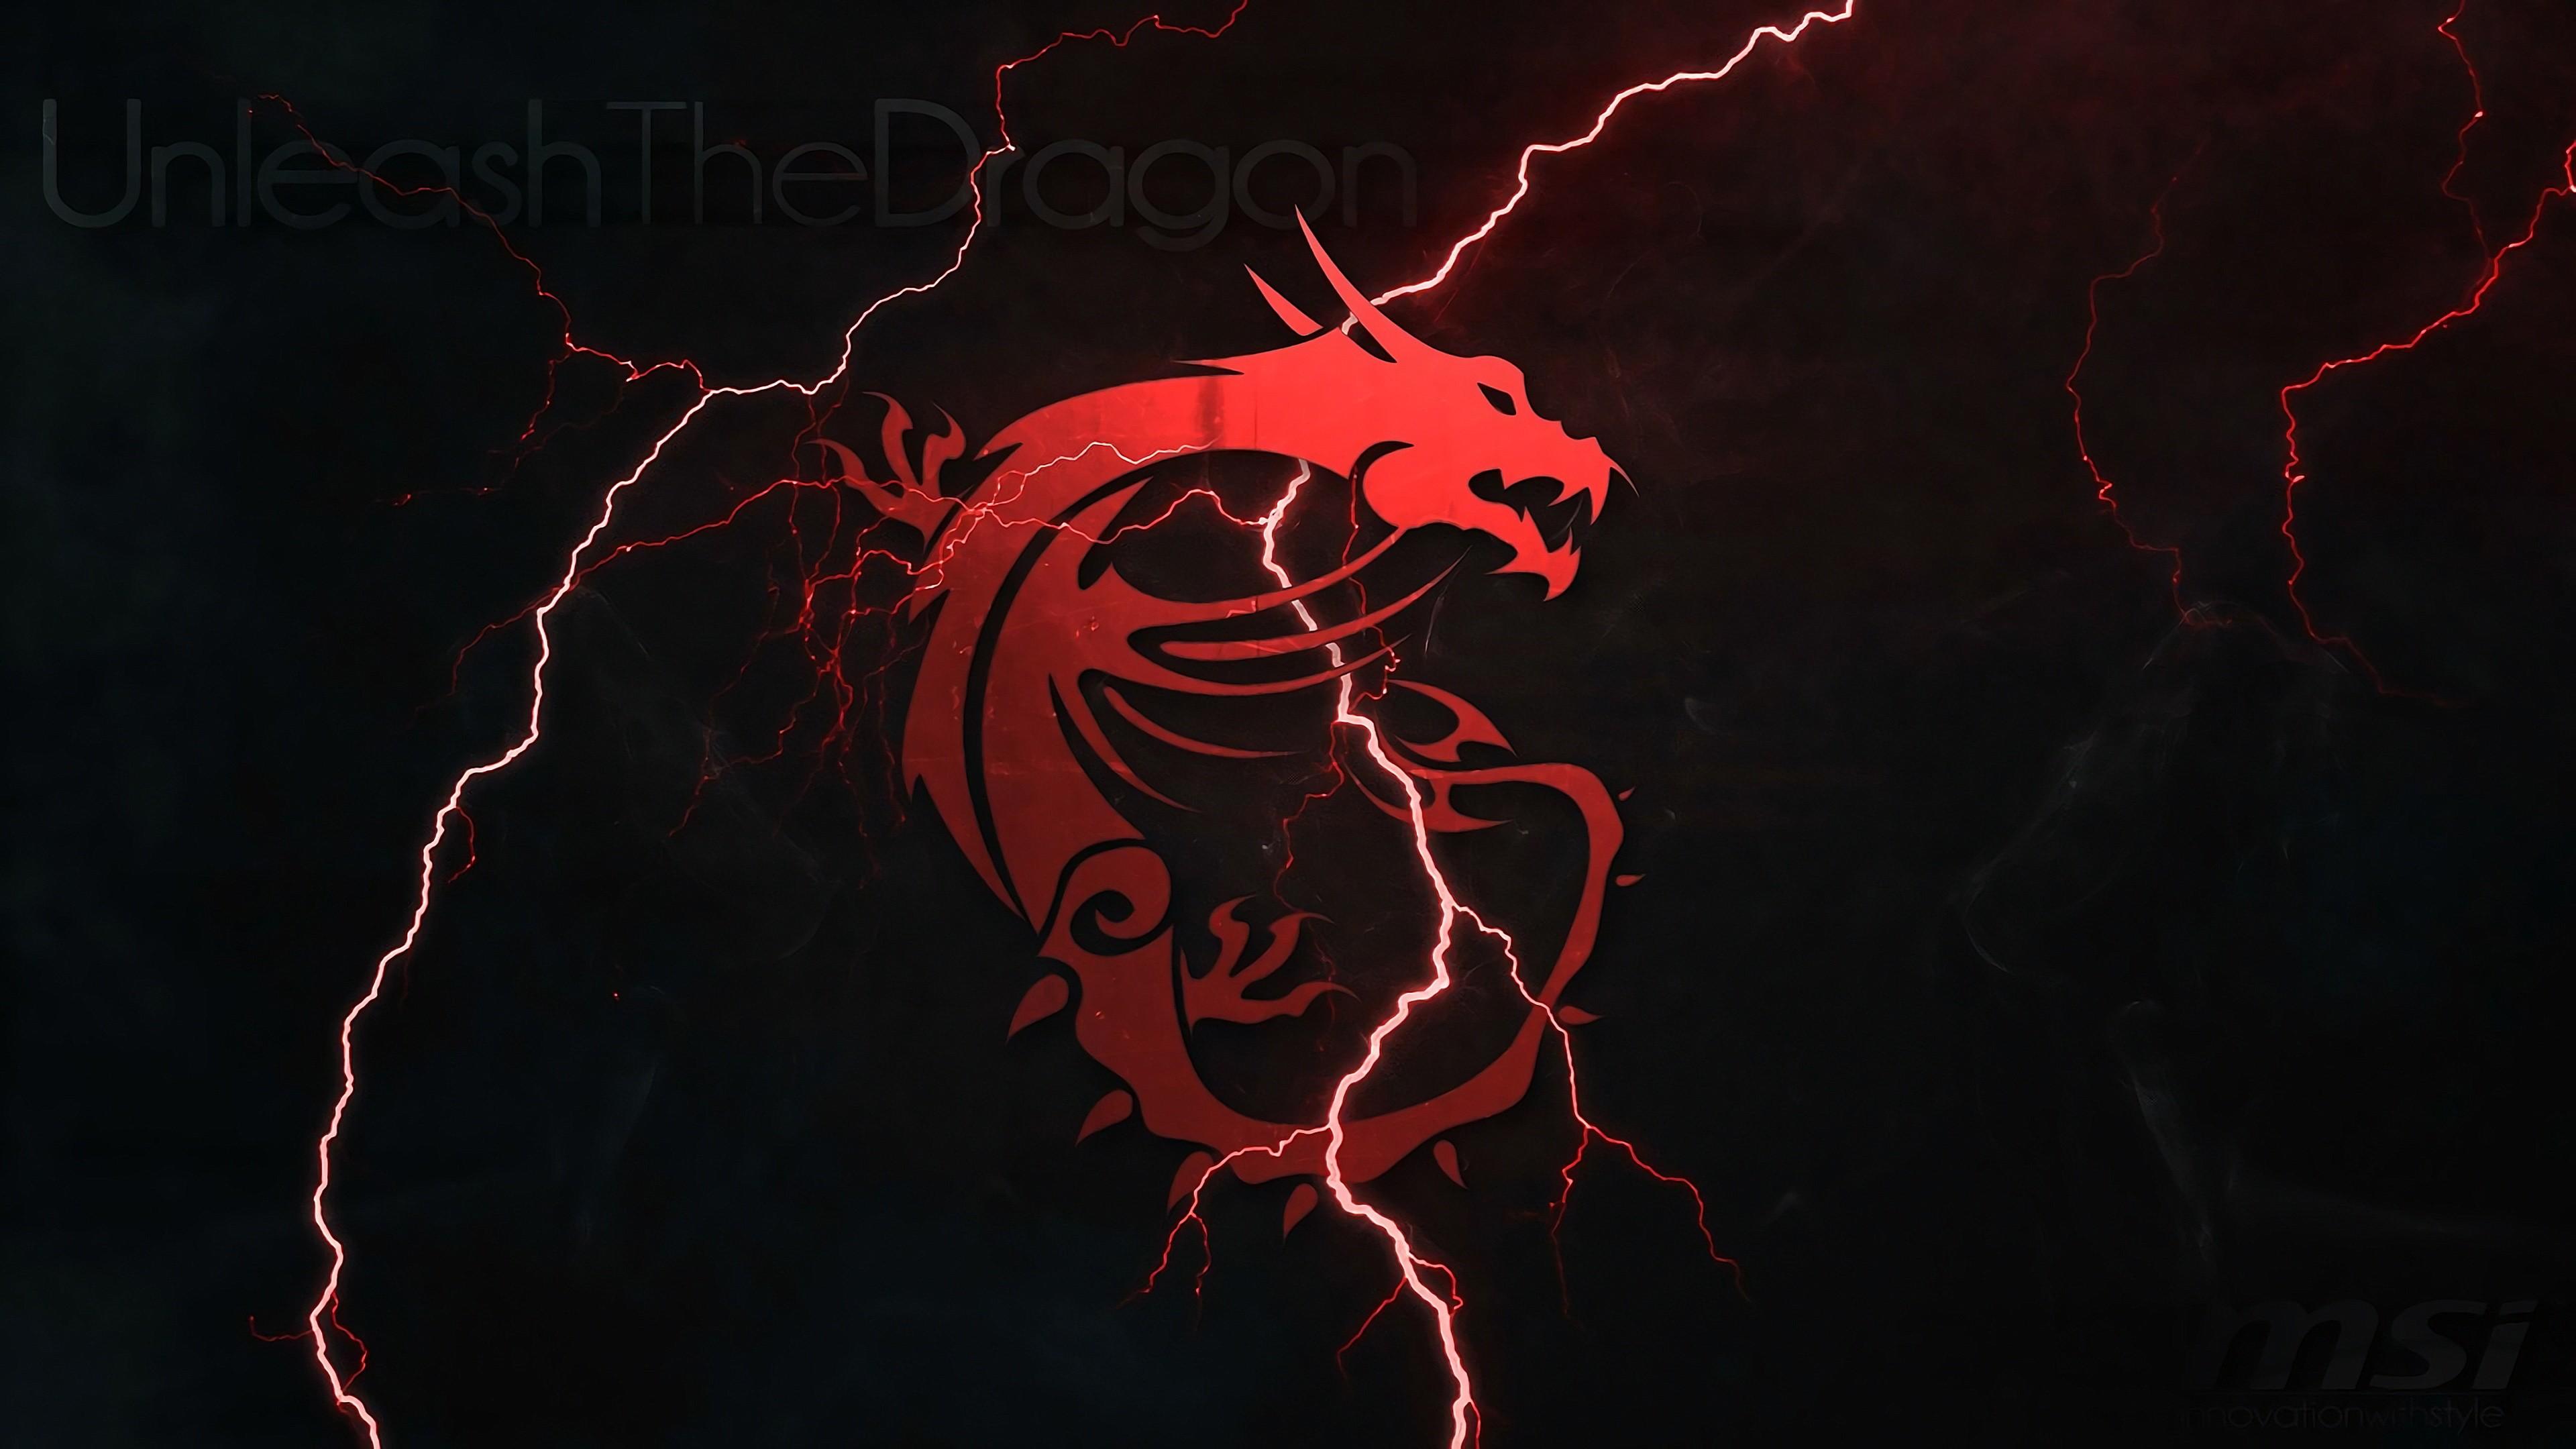 MSI Dragon Logo Lightning 4k wallpaper